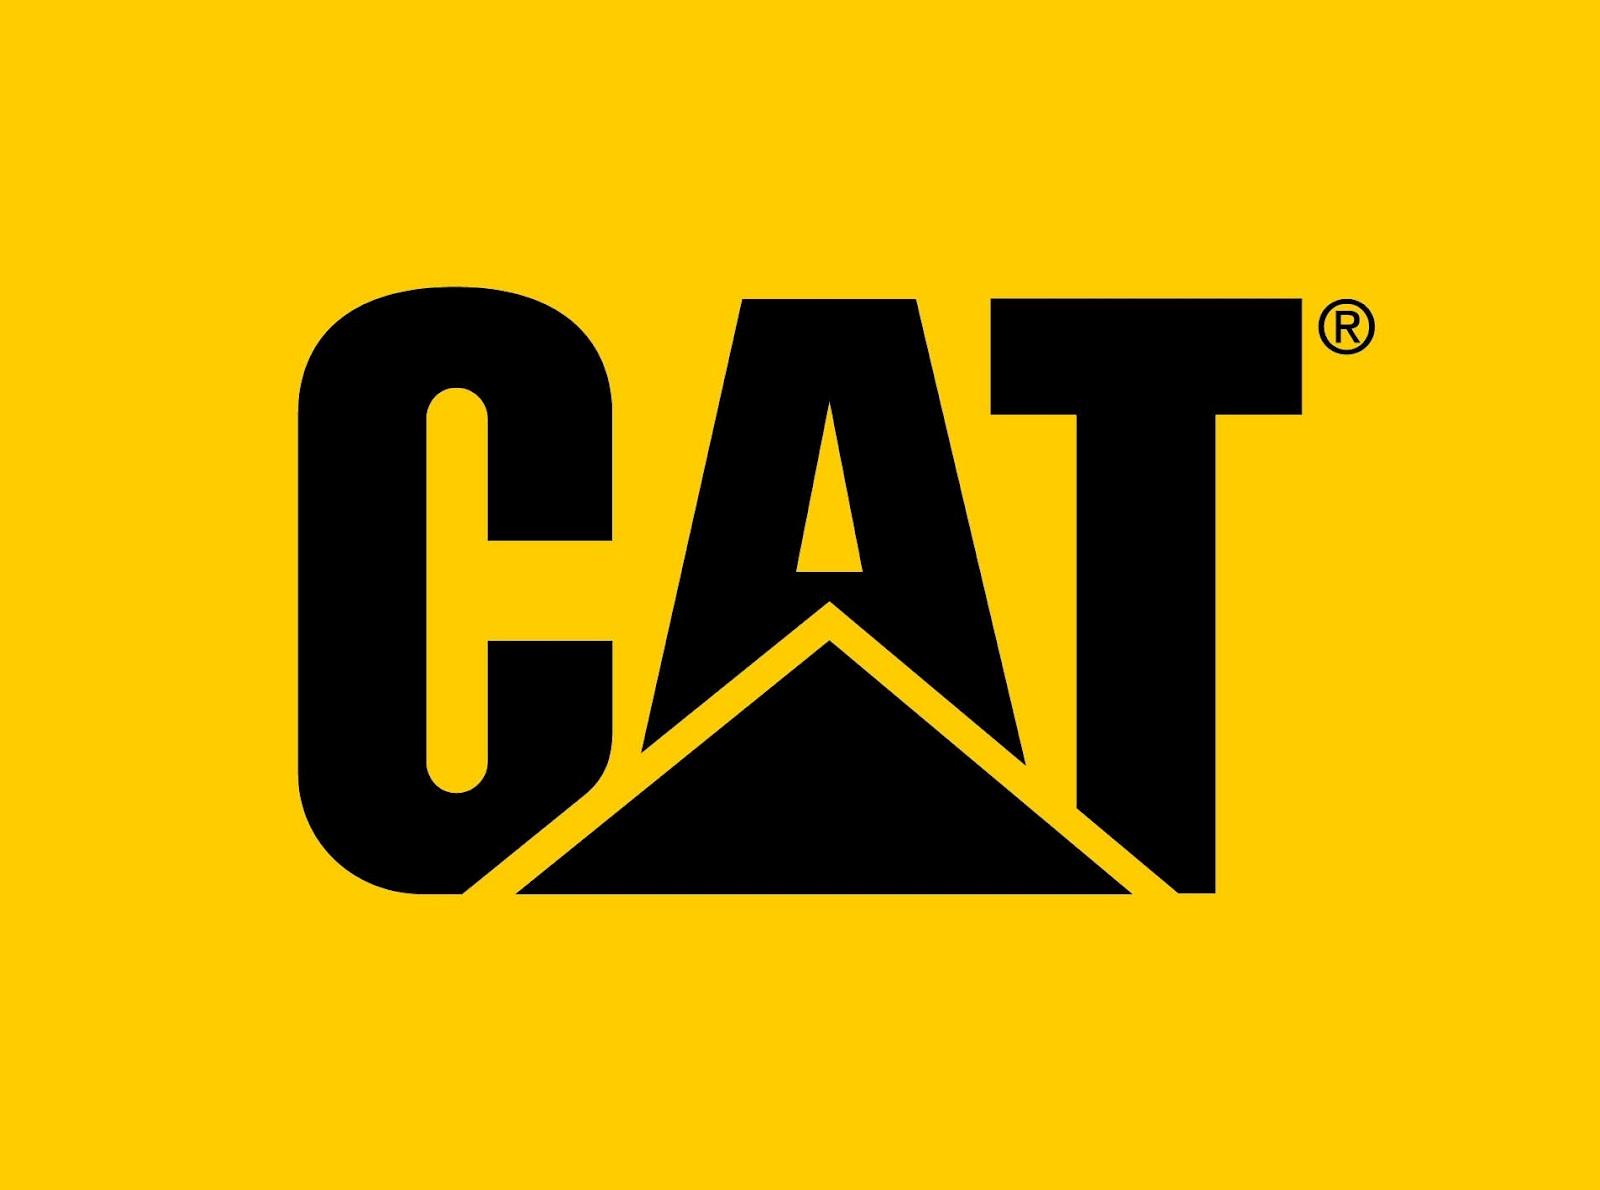 Caterpillar Logo_1485897990978.jpg